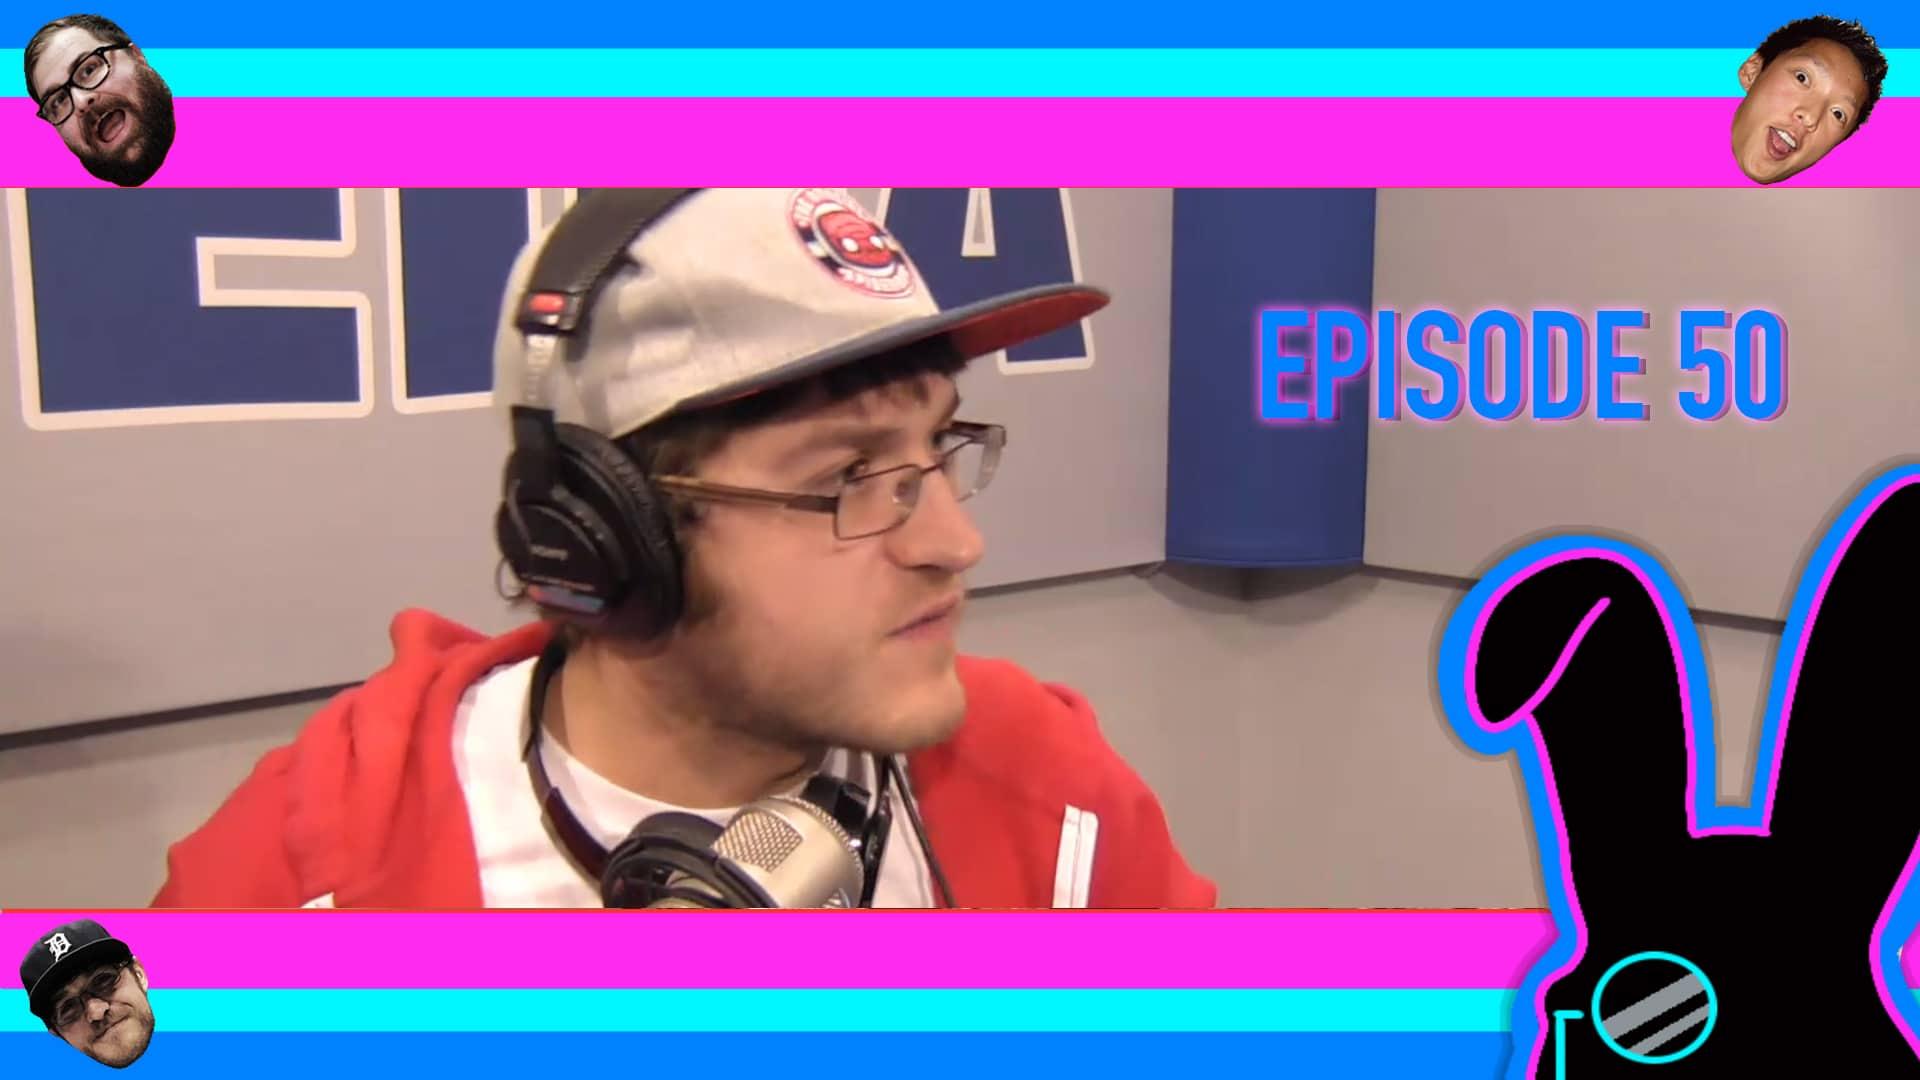 Geektainment Weekly - Episode 50